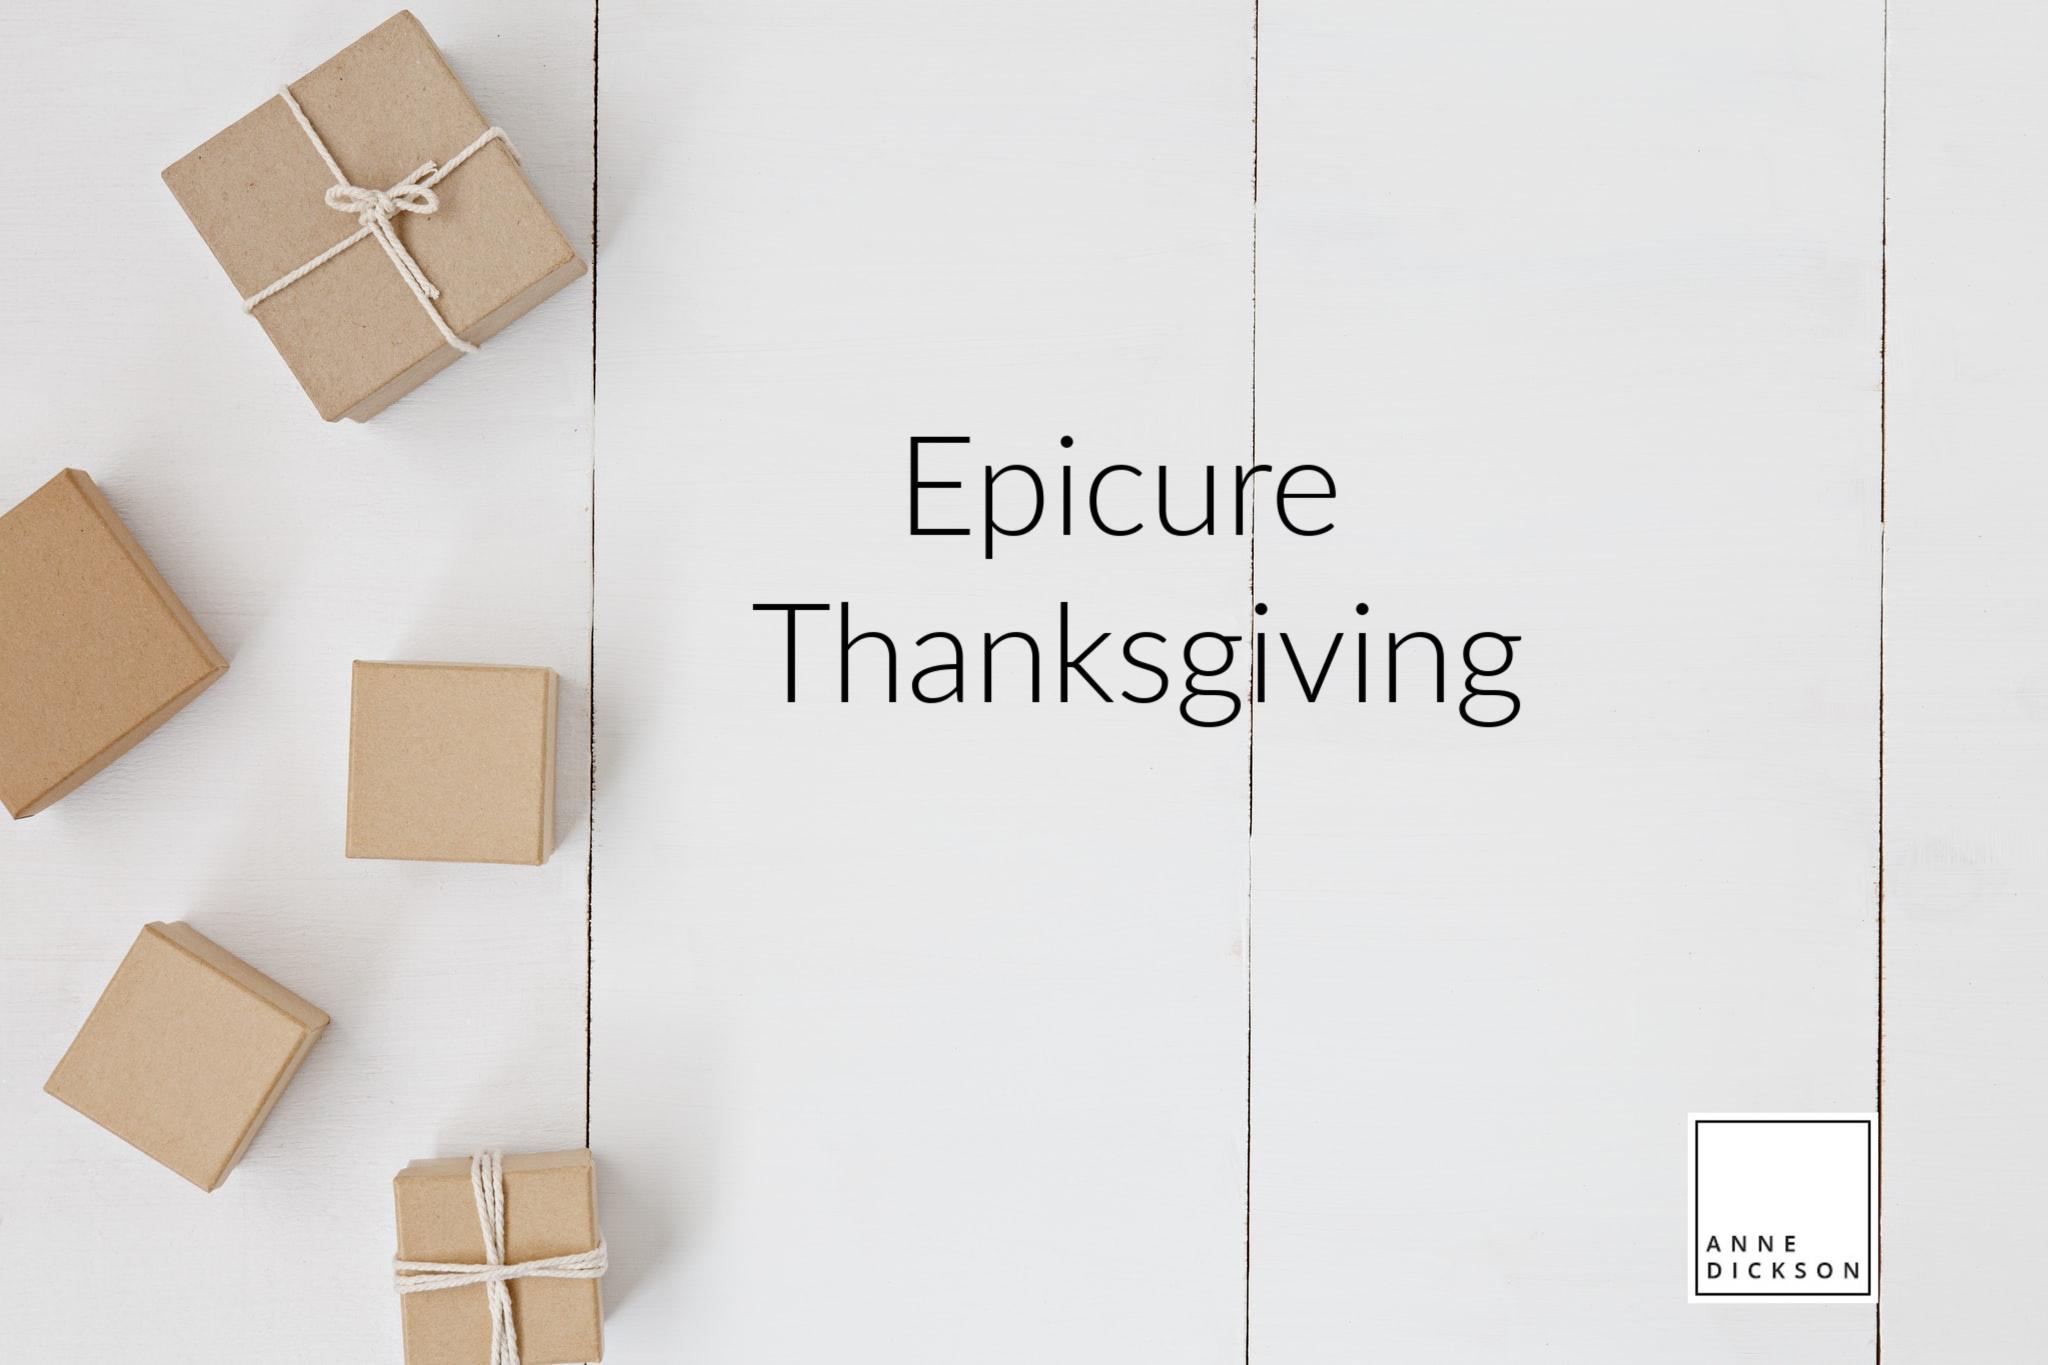 Epicure Thanksgiving